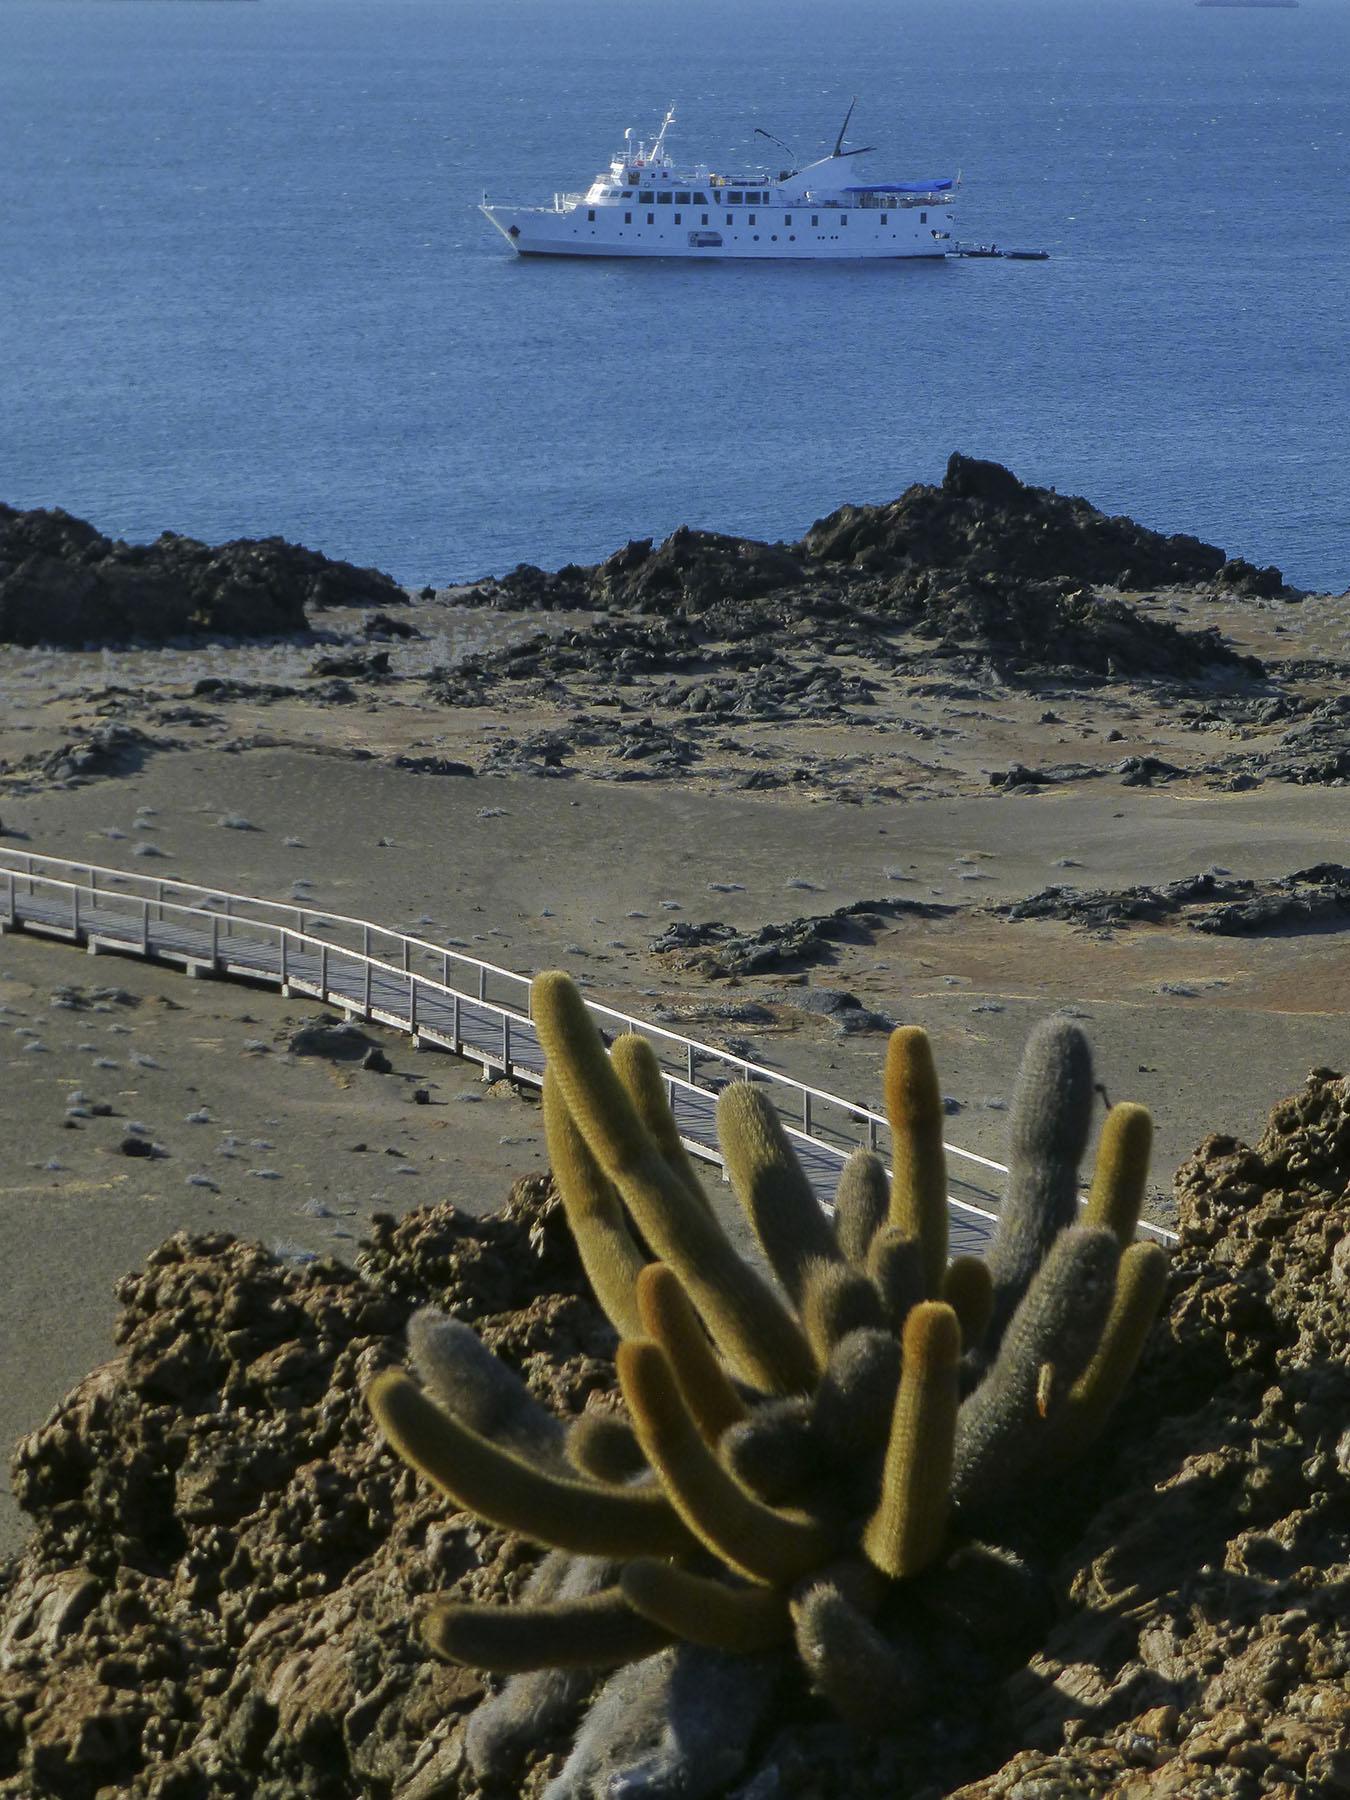 Bartolome Island's Volcanic Landscape